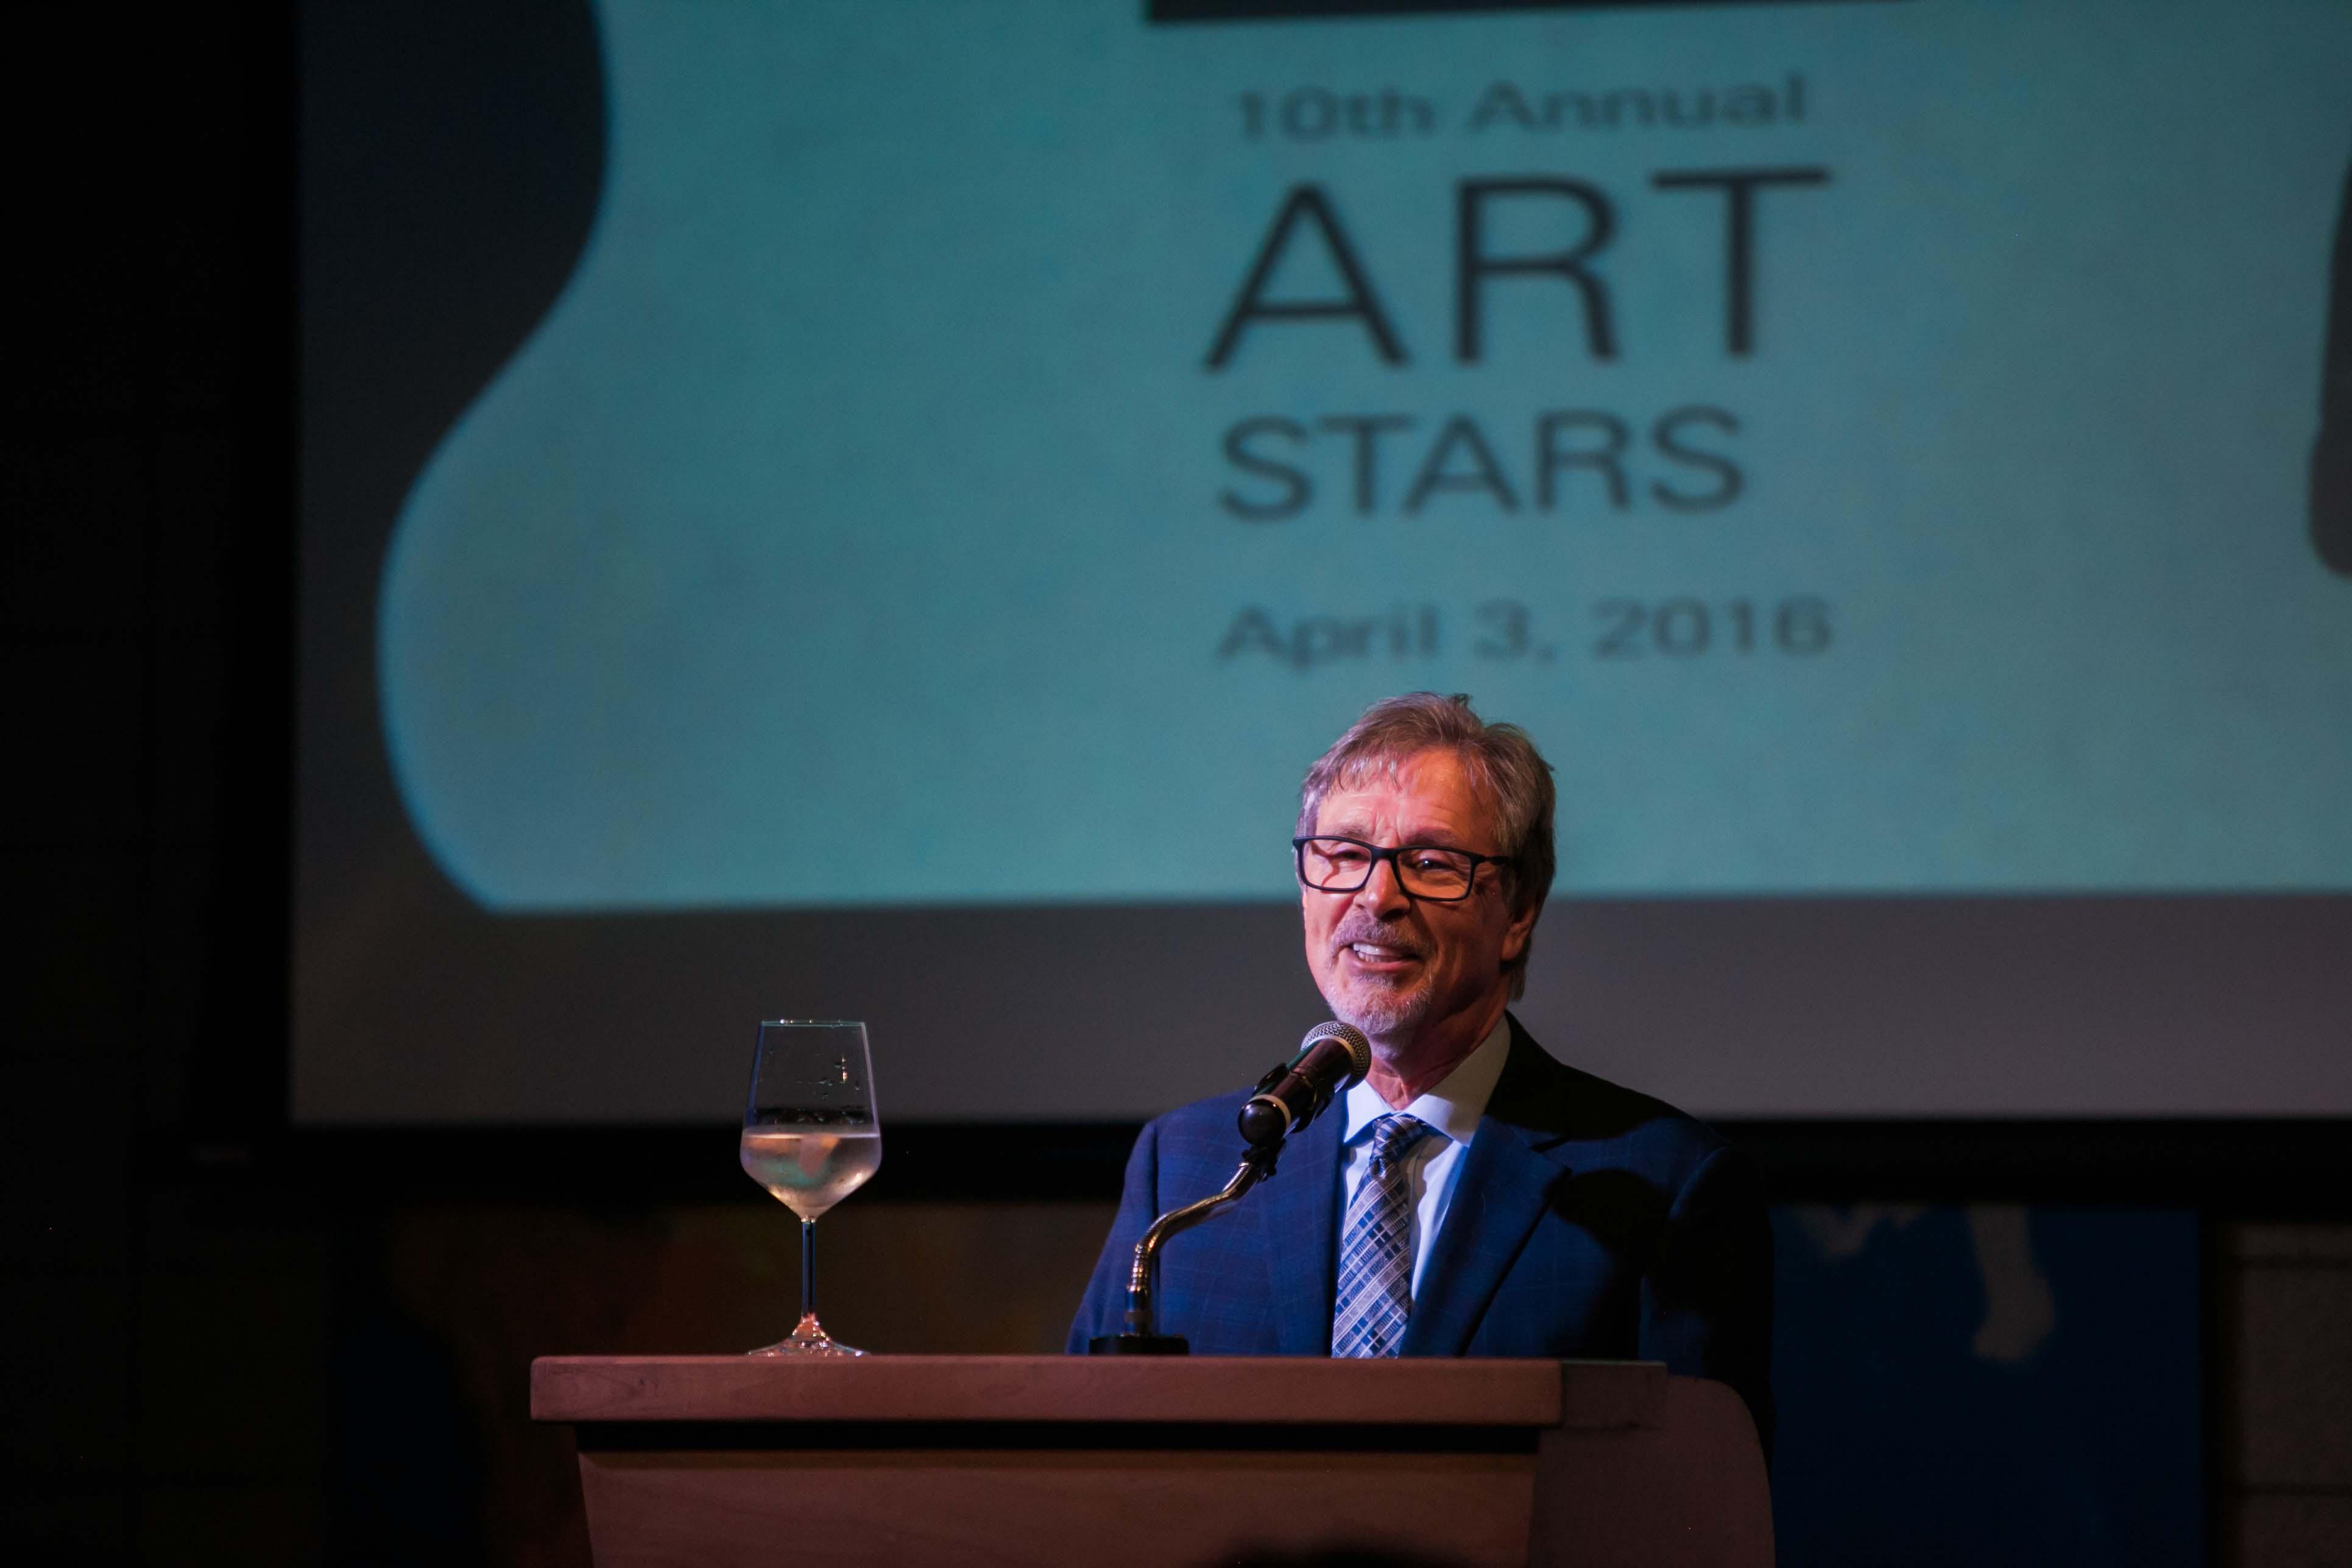 The 10th Annual Art Star Awards